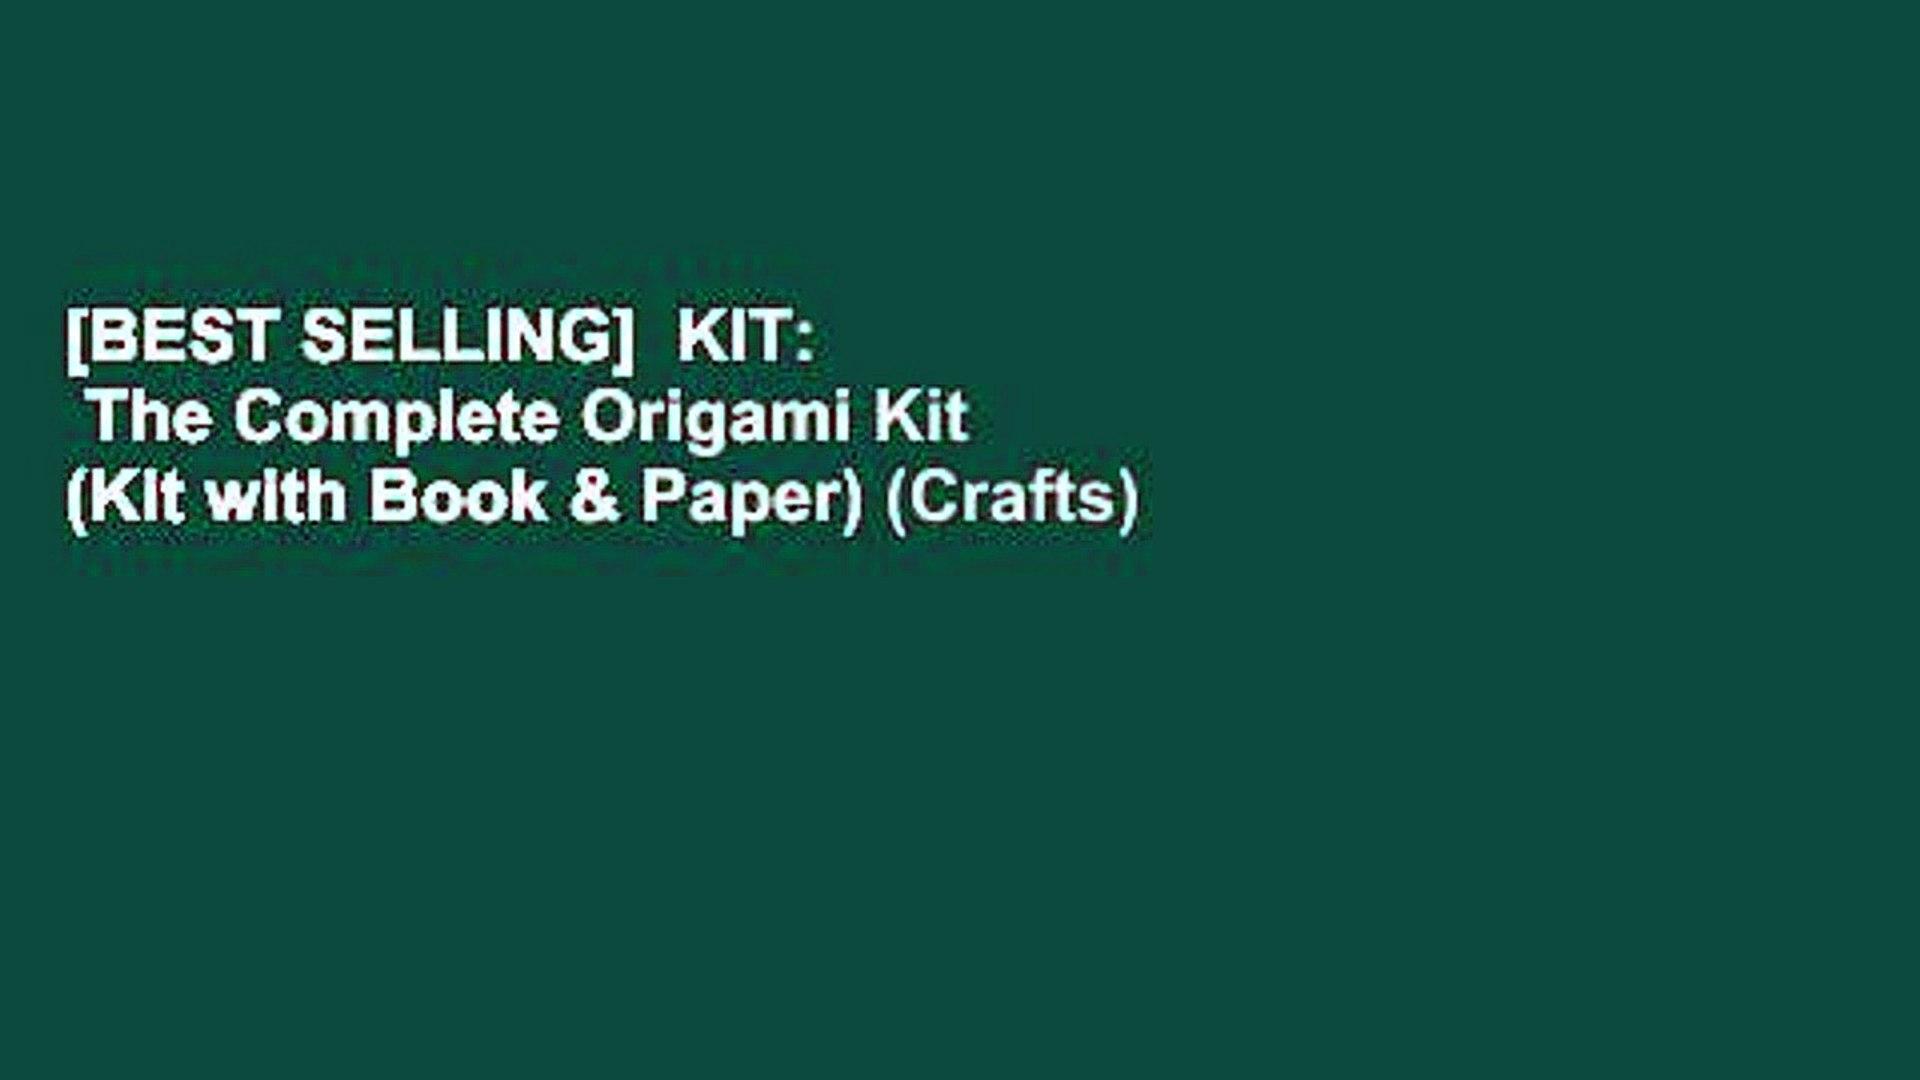 39 Best Origami Books images | Origami, Book origami, Origami for ... | 1080x1920